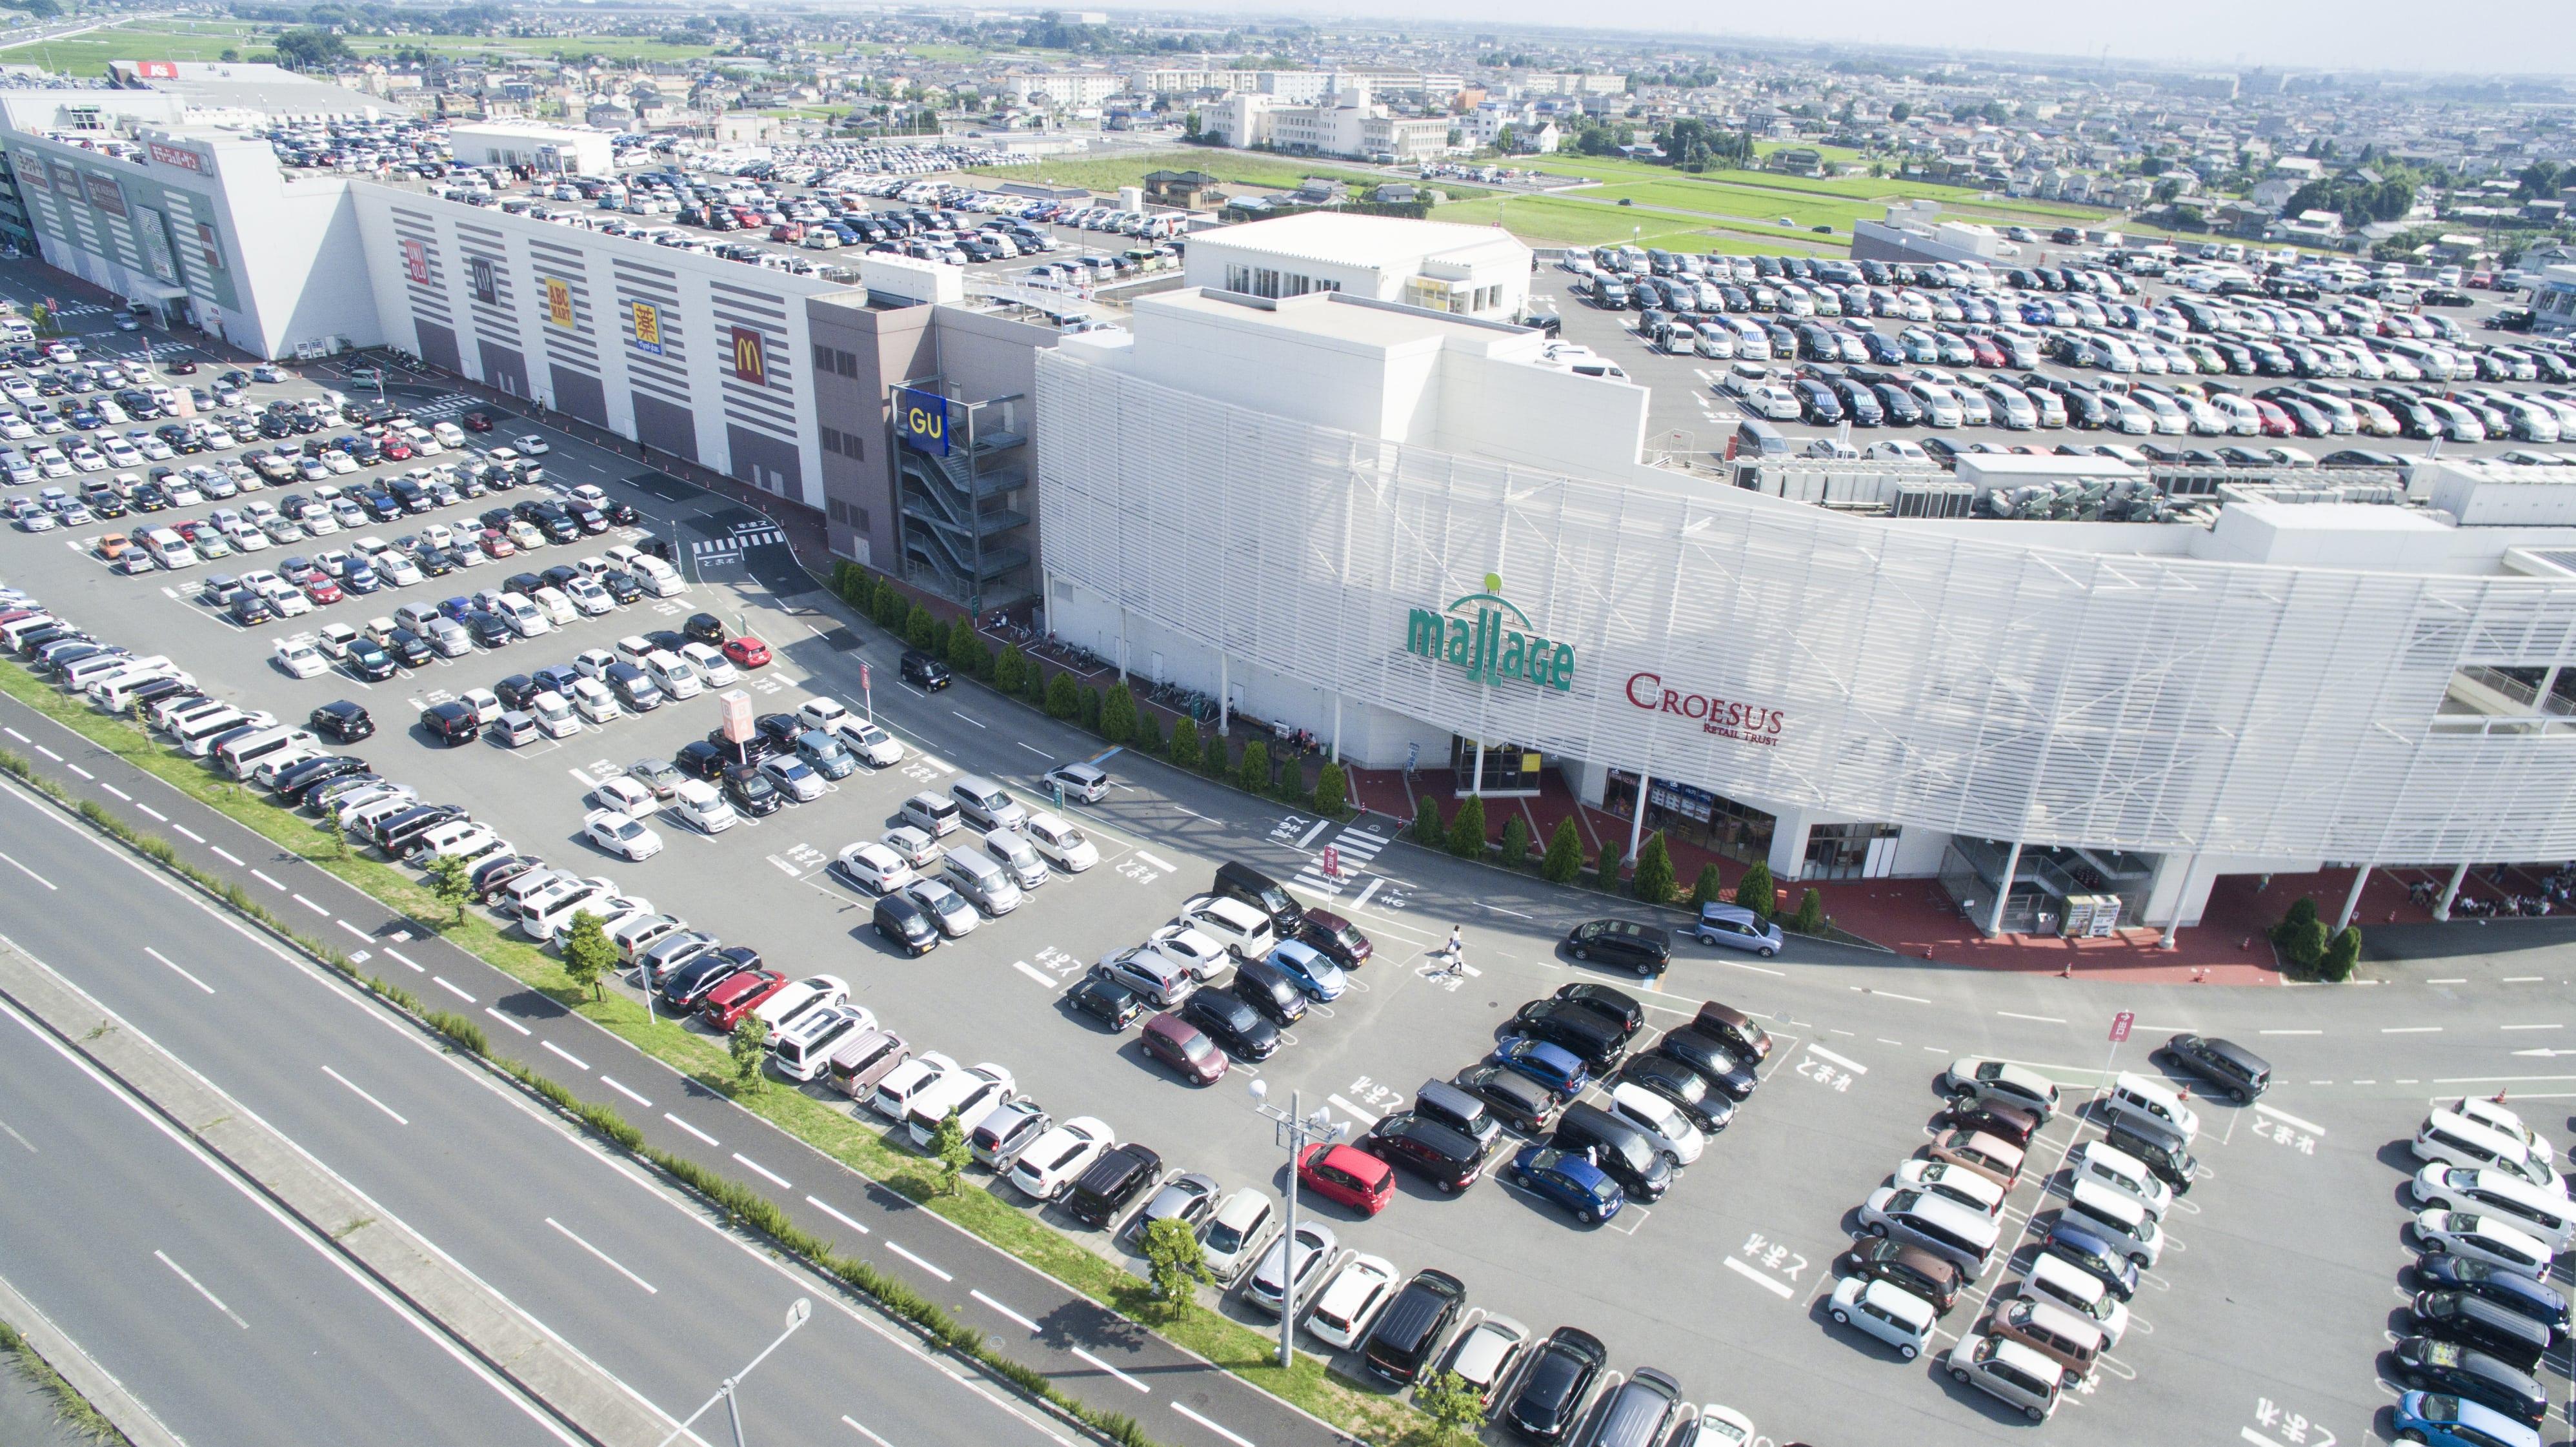 Croesus Retail Trust's Mallage Shobu. (Photo: Croesus Retail Trust)